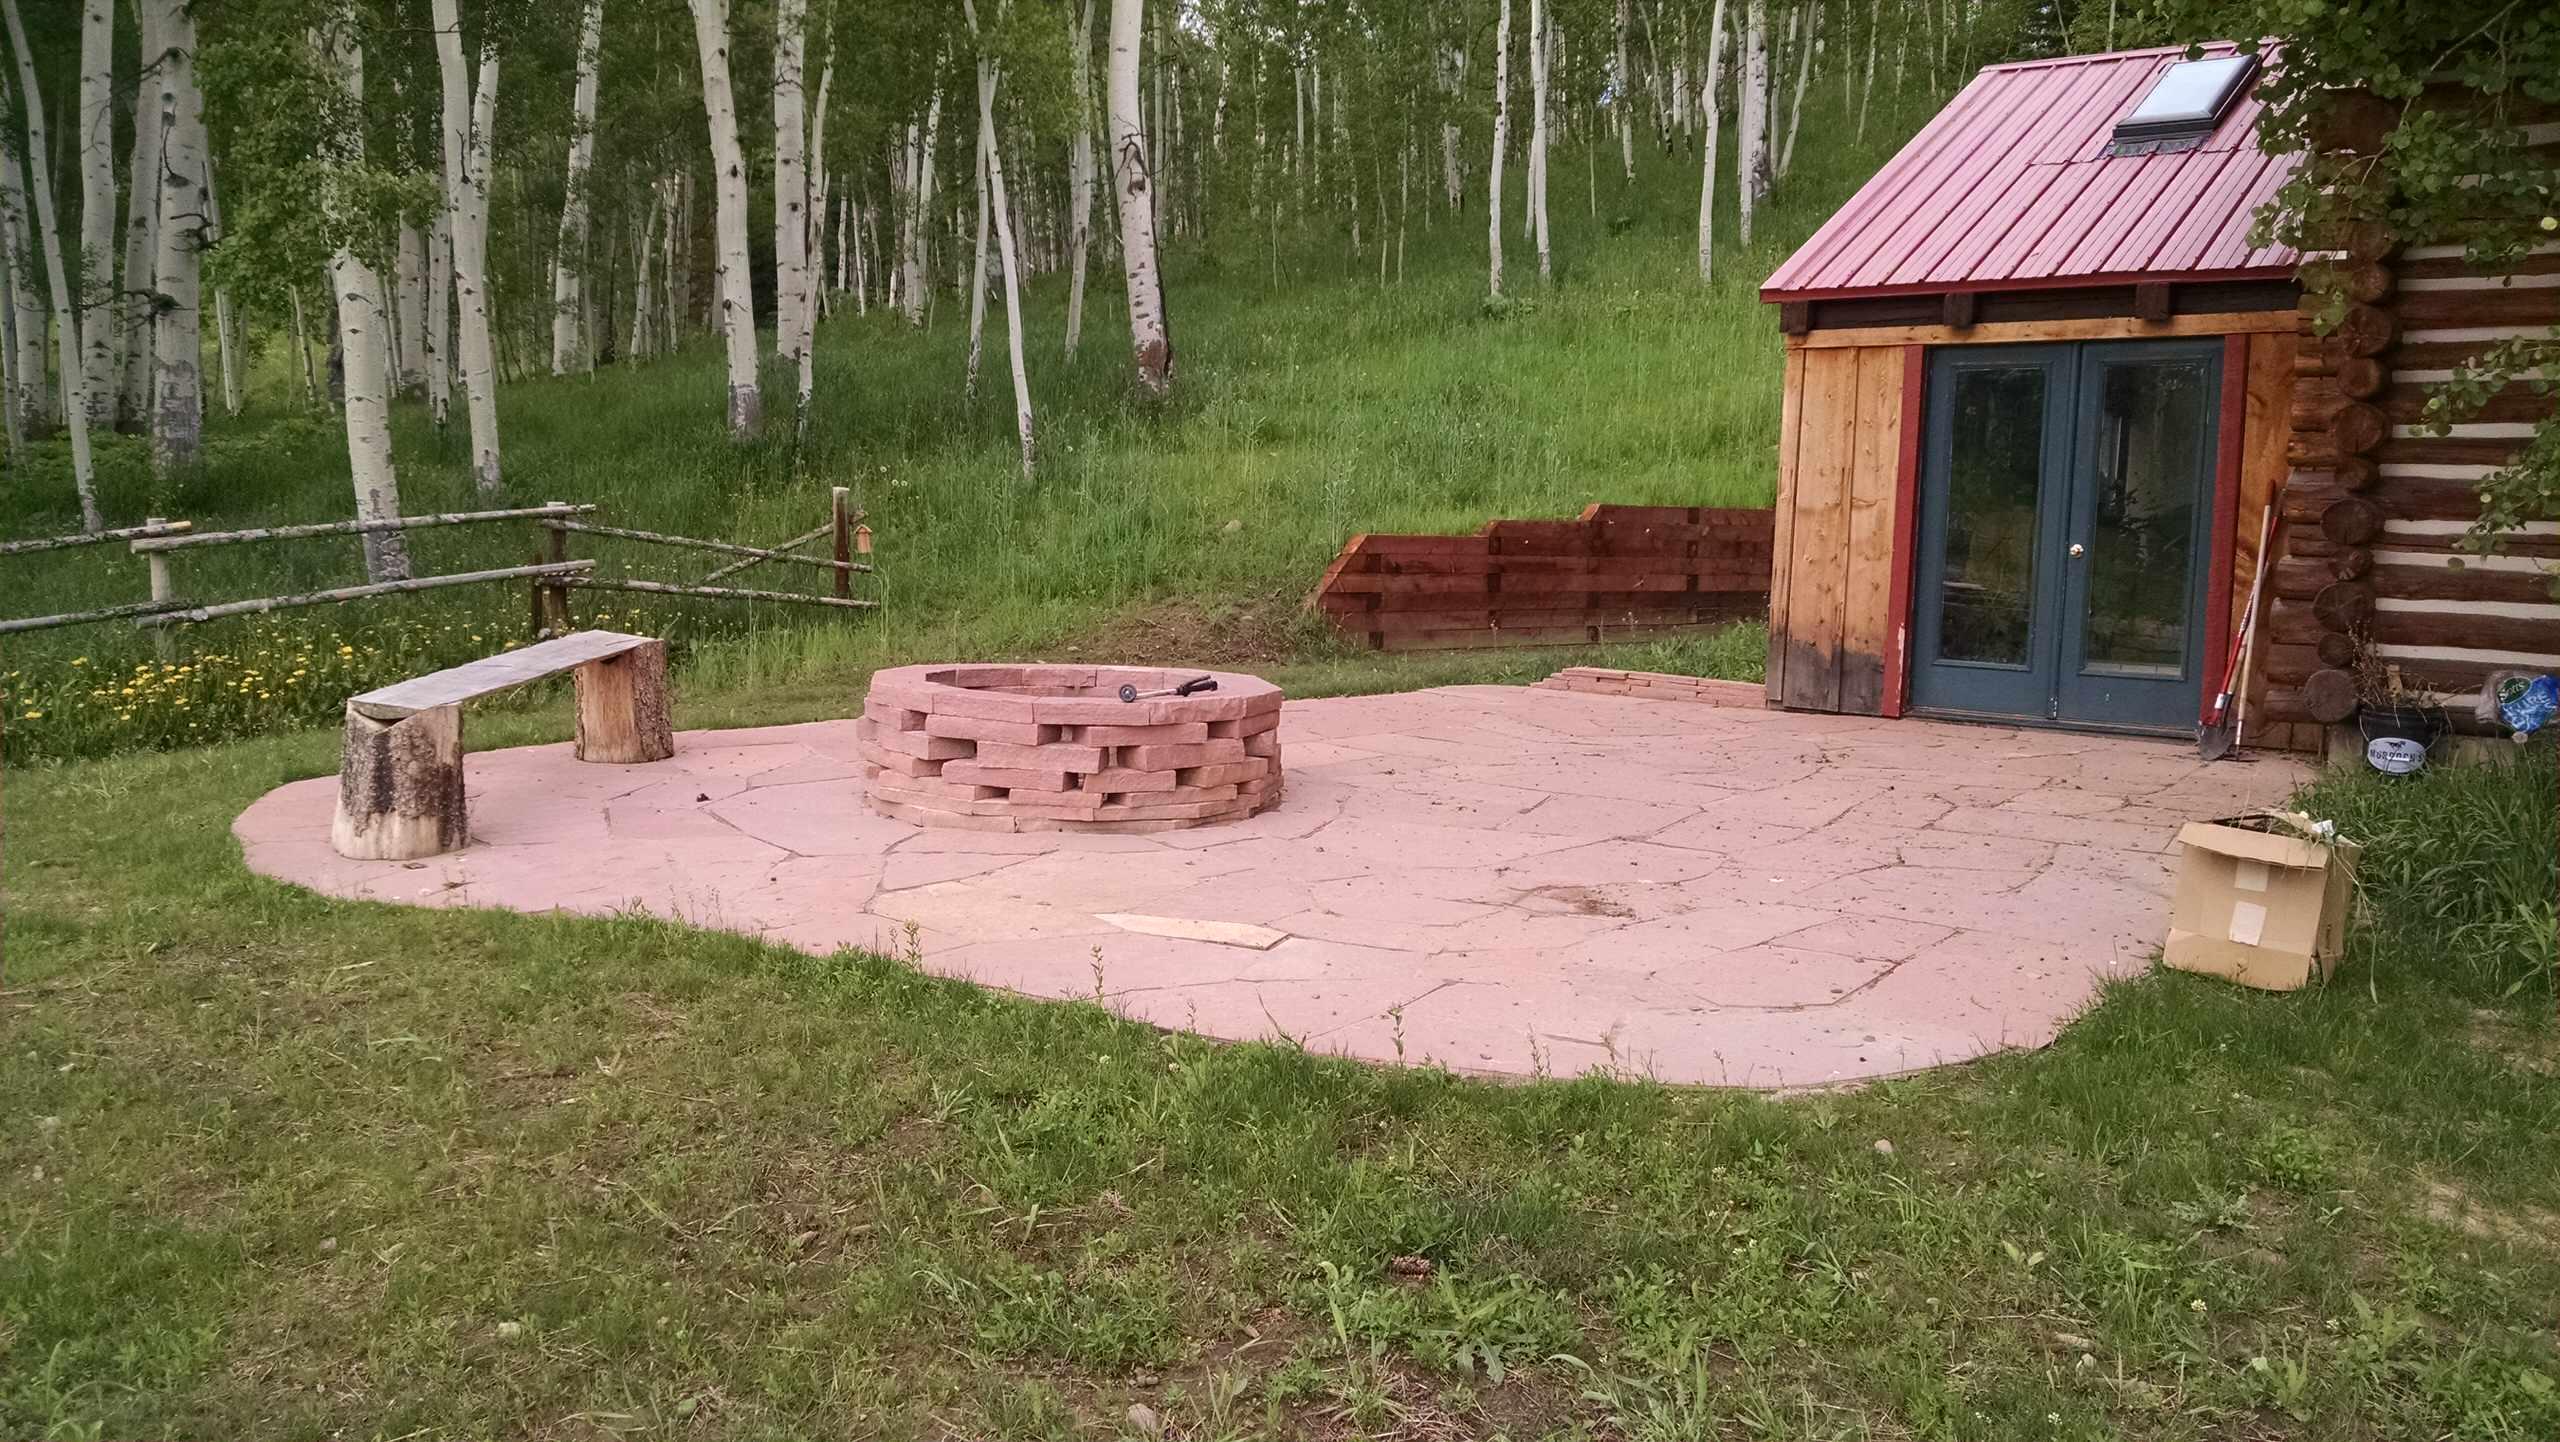 Patio & Fire pit, good idea